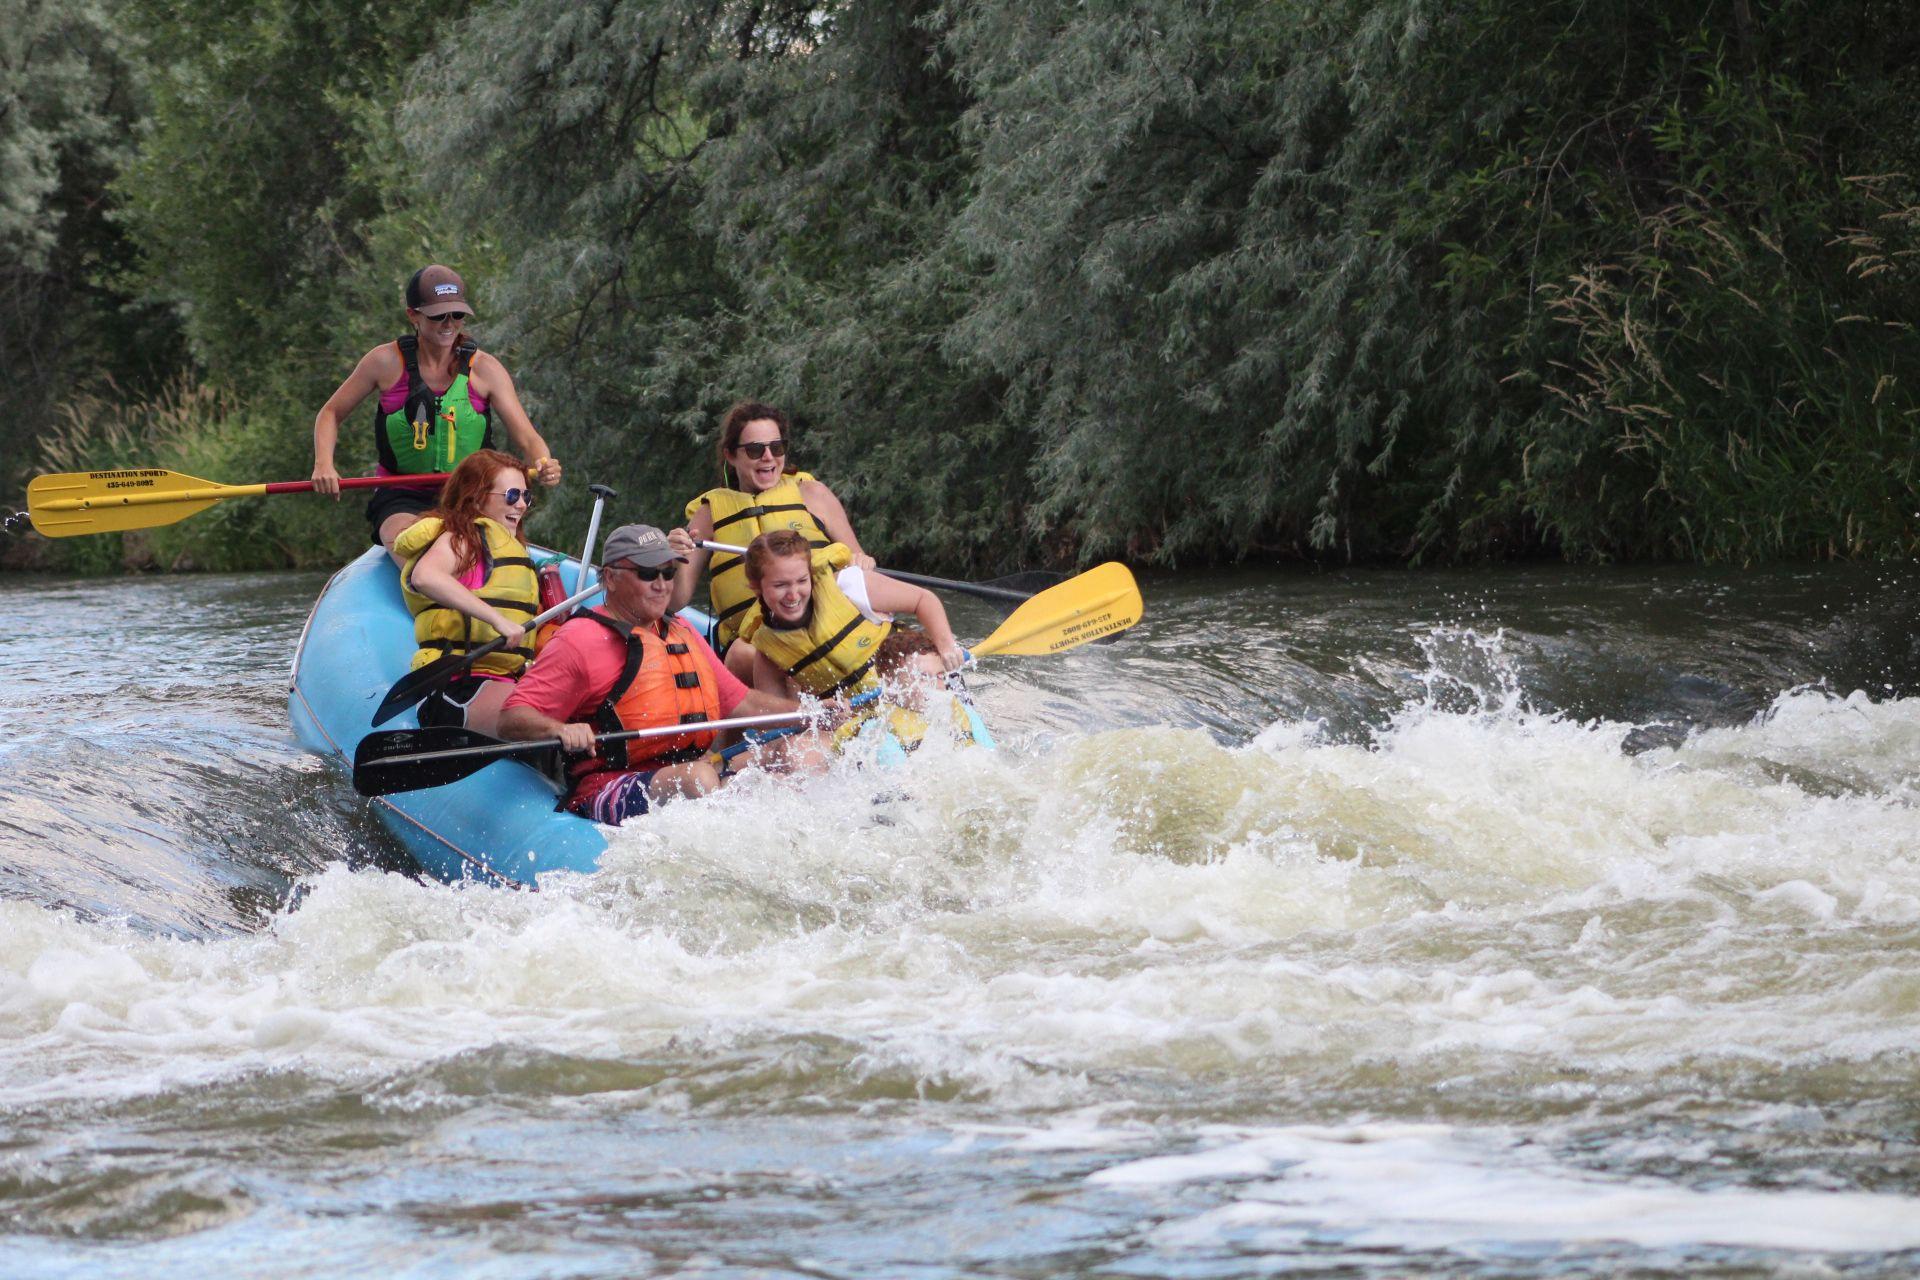 Half-Day River Rafting Trip